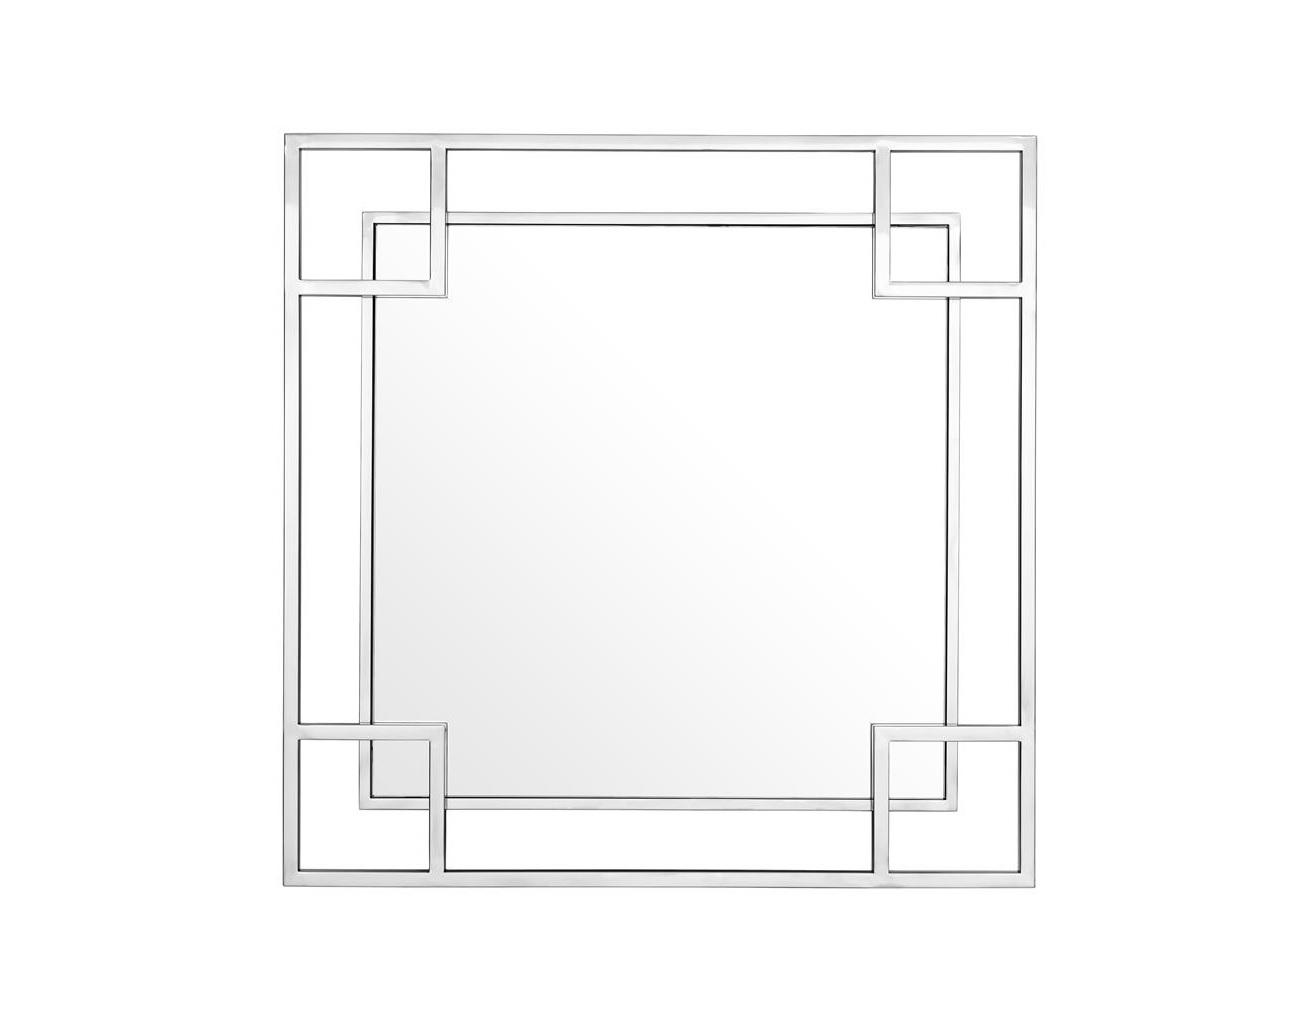 Зеркало MorrisНастенные зеркала<br><br><br>Material: Металл<br>Width см: 90<br>Height см: 90